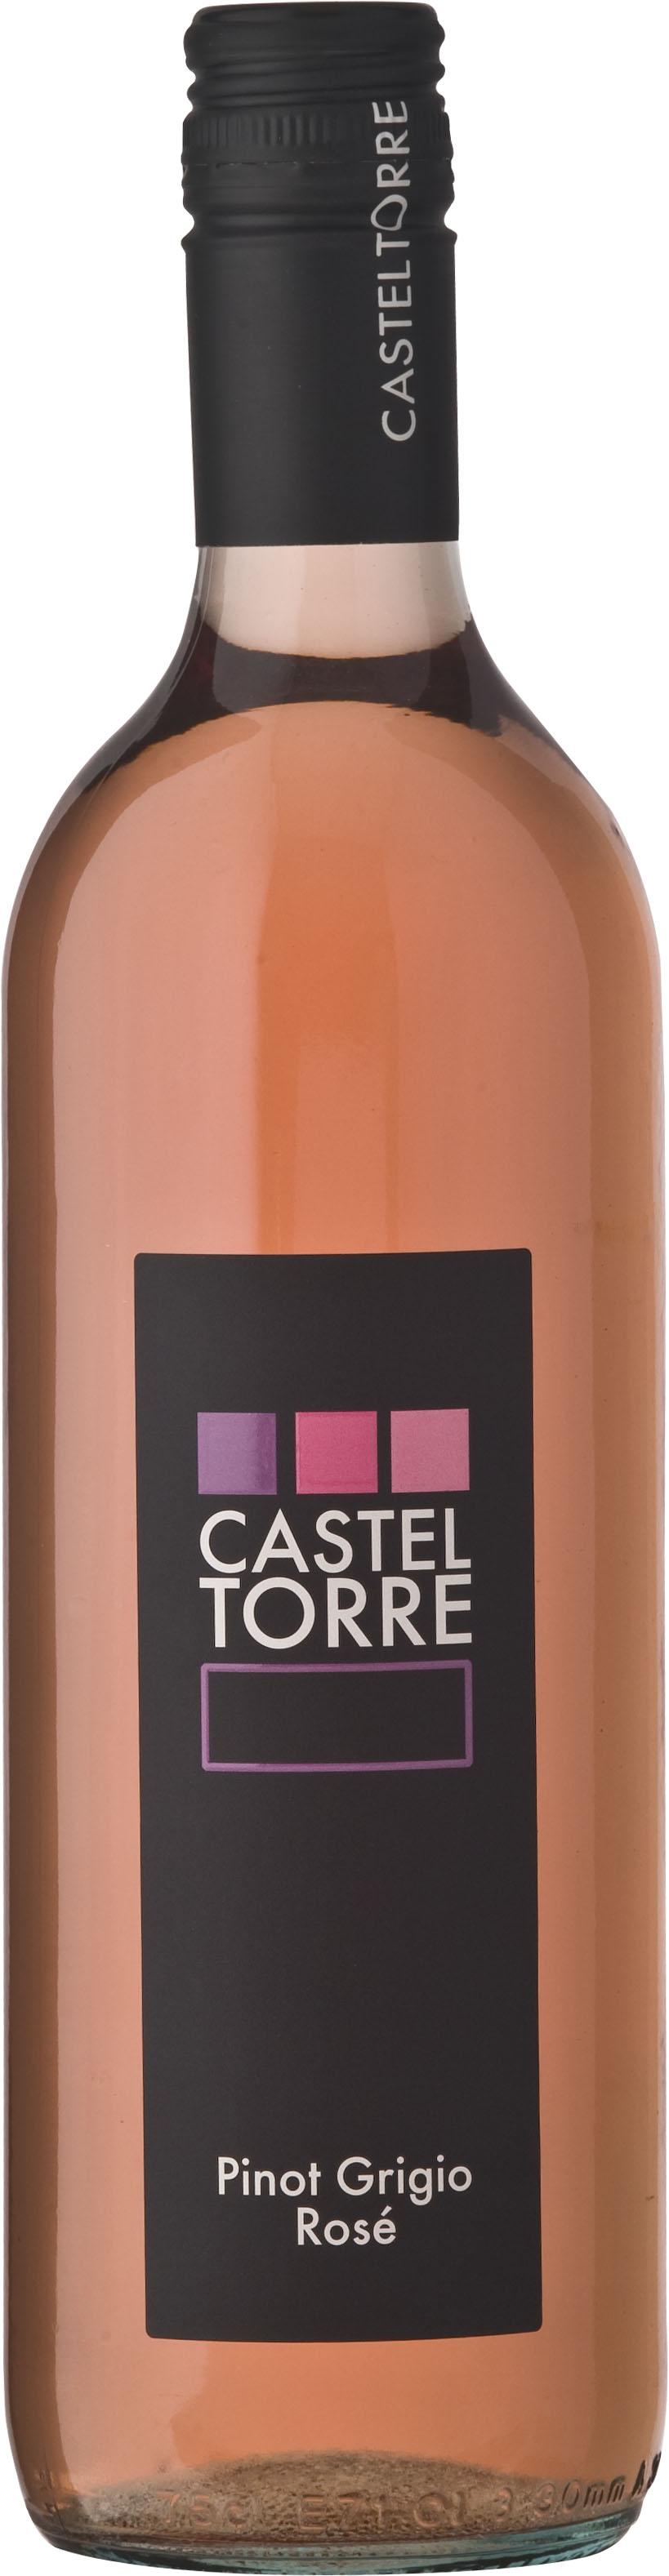 casteltorre-pinot-grigio-rose-igt-venezie_2416-(2)